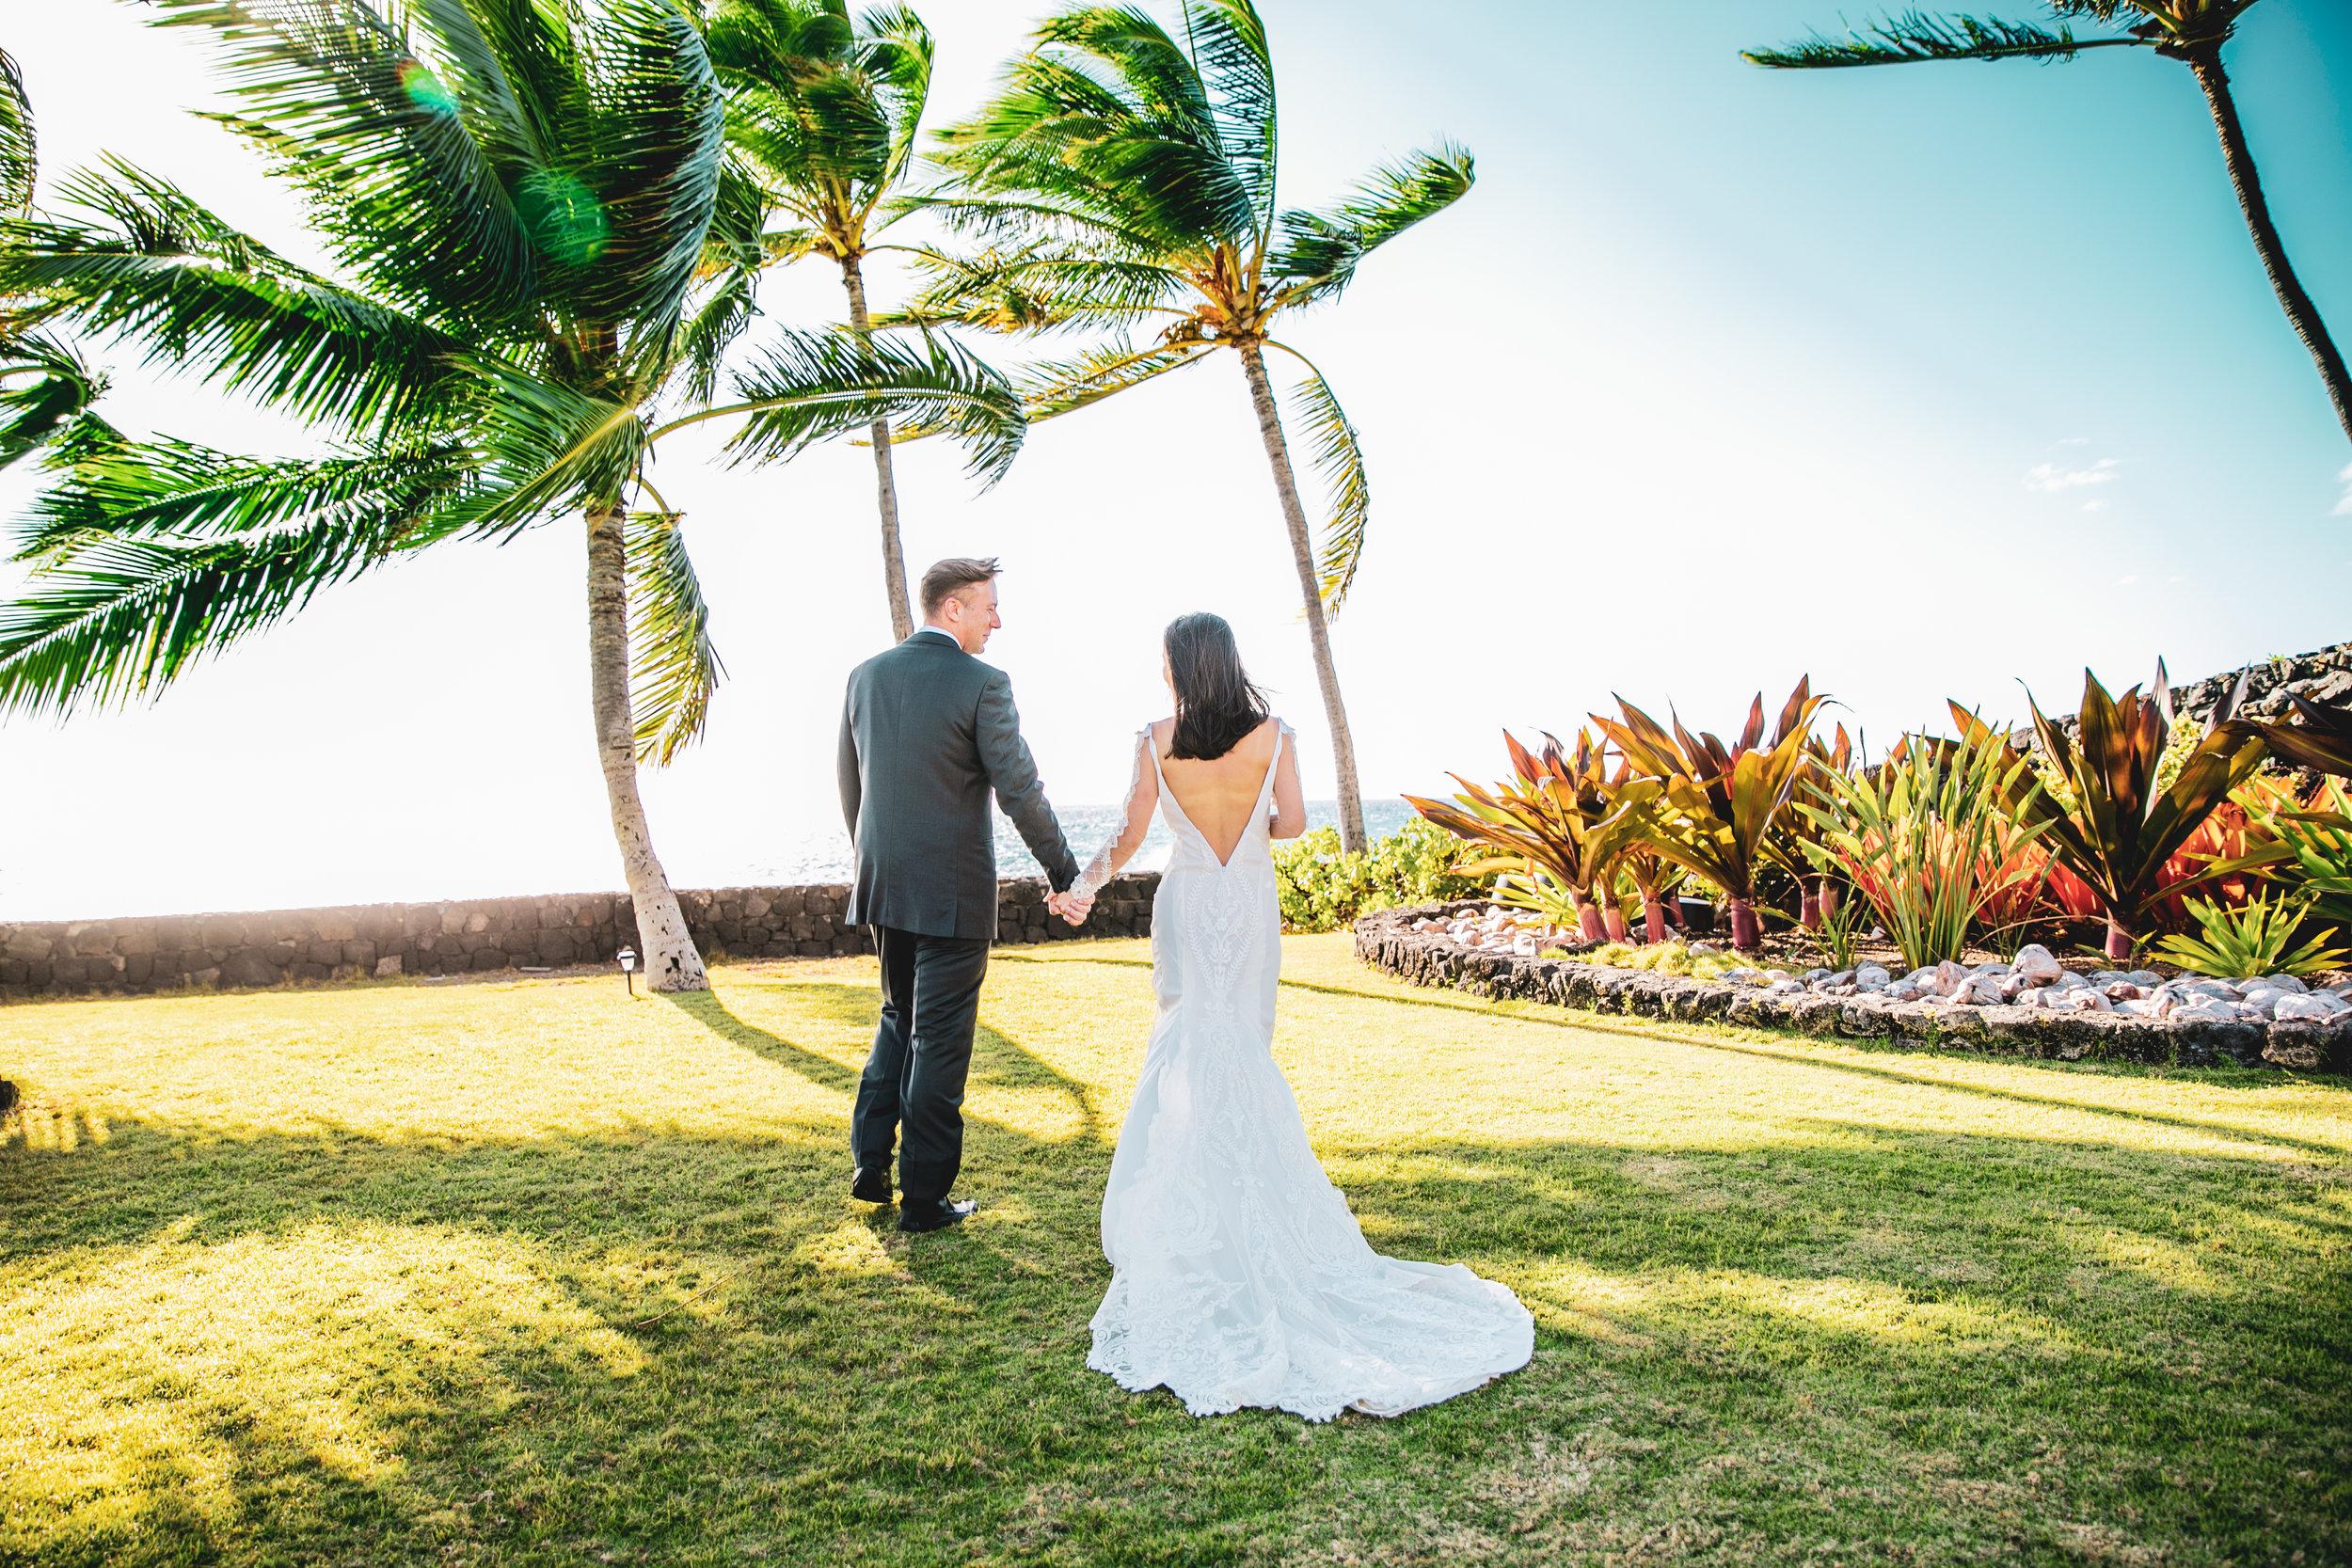 kelilina photography hawaii florida destination wedding photographer-42.jpg